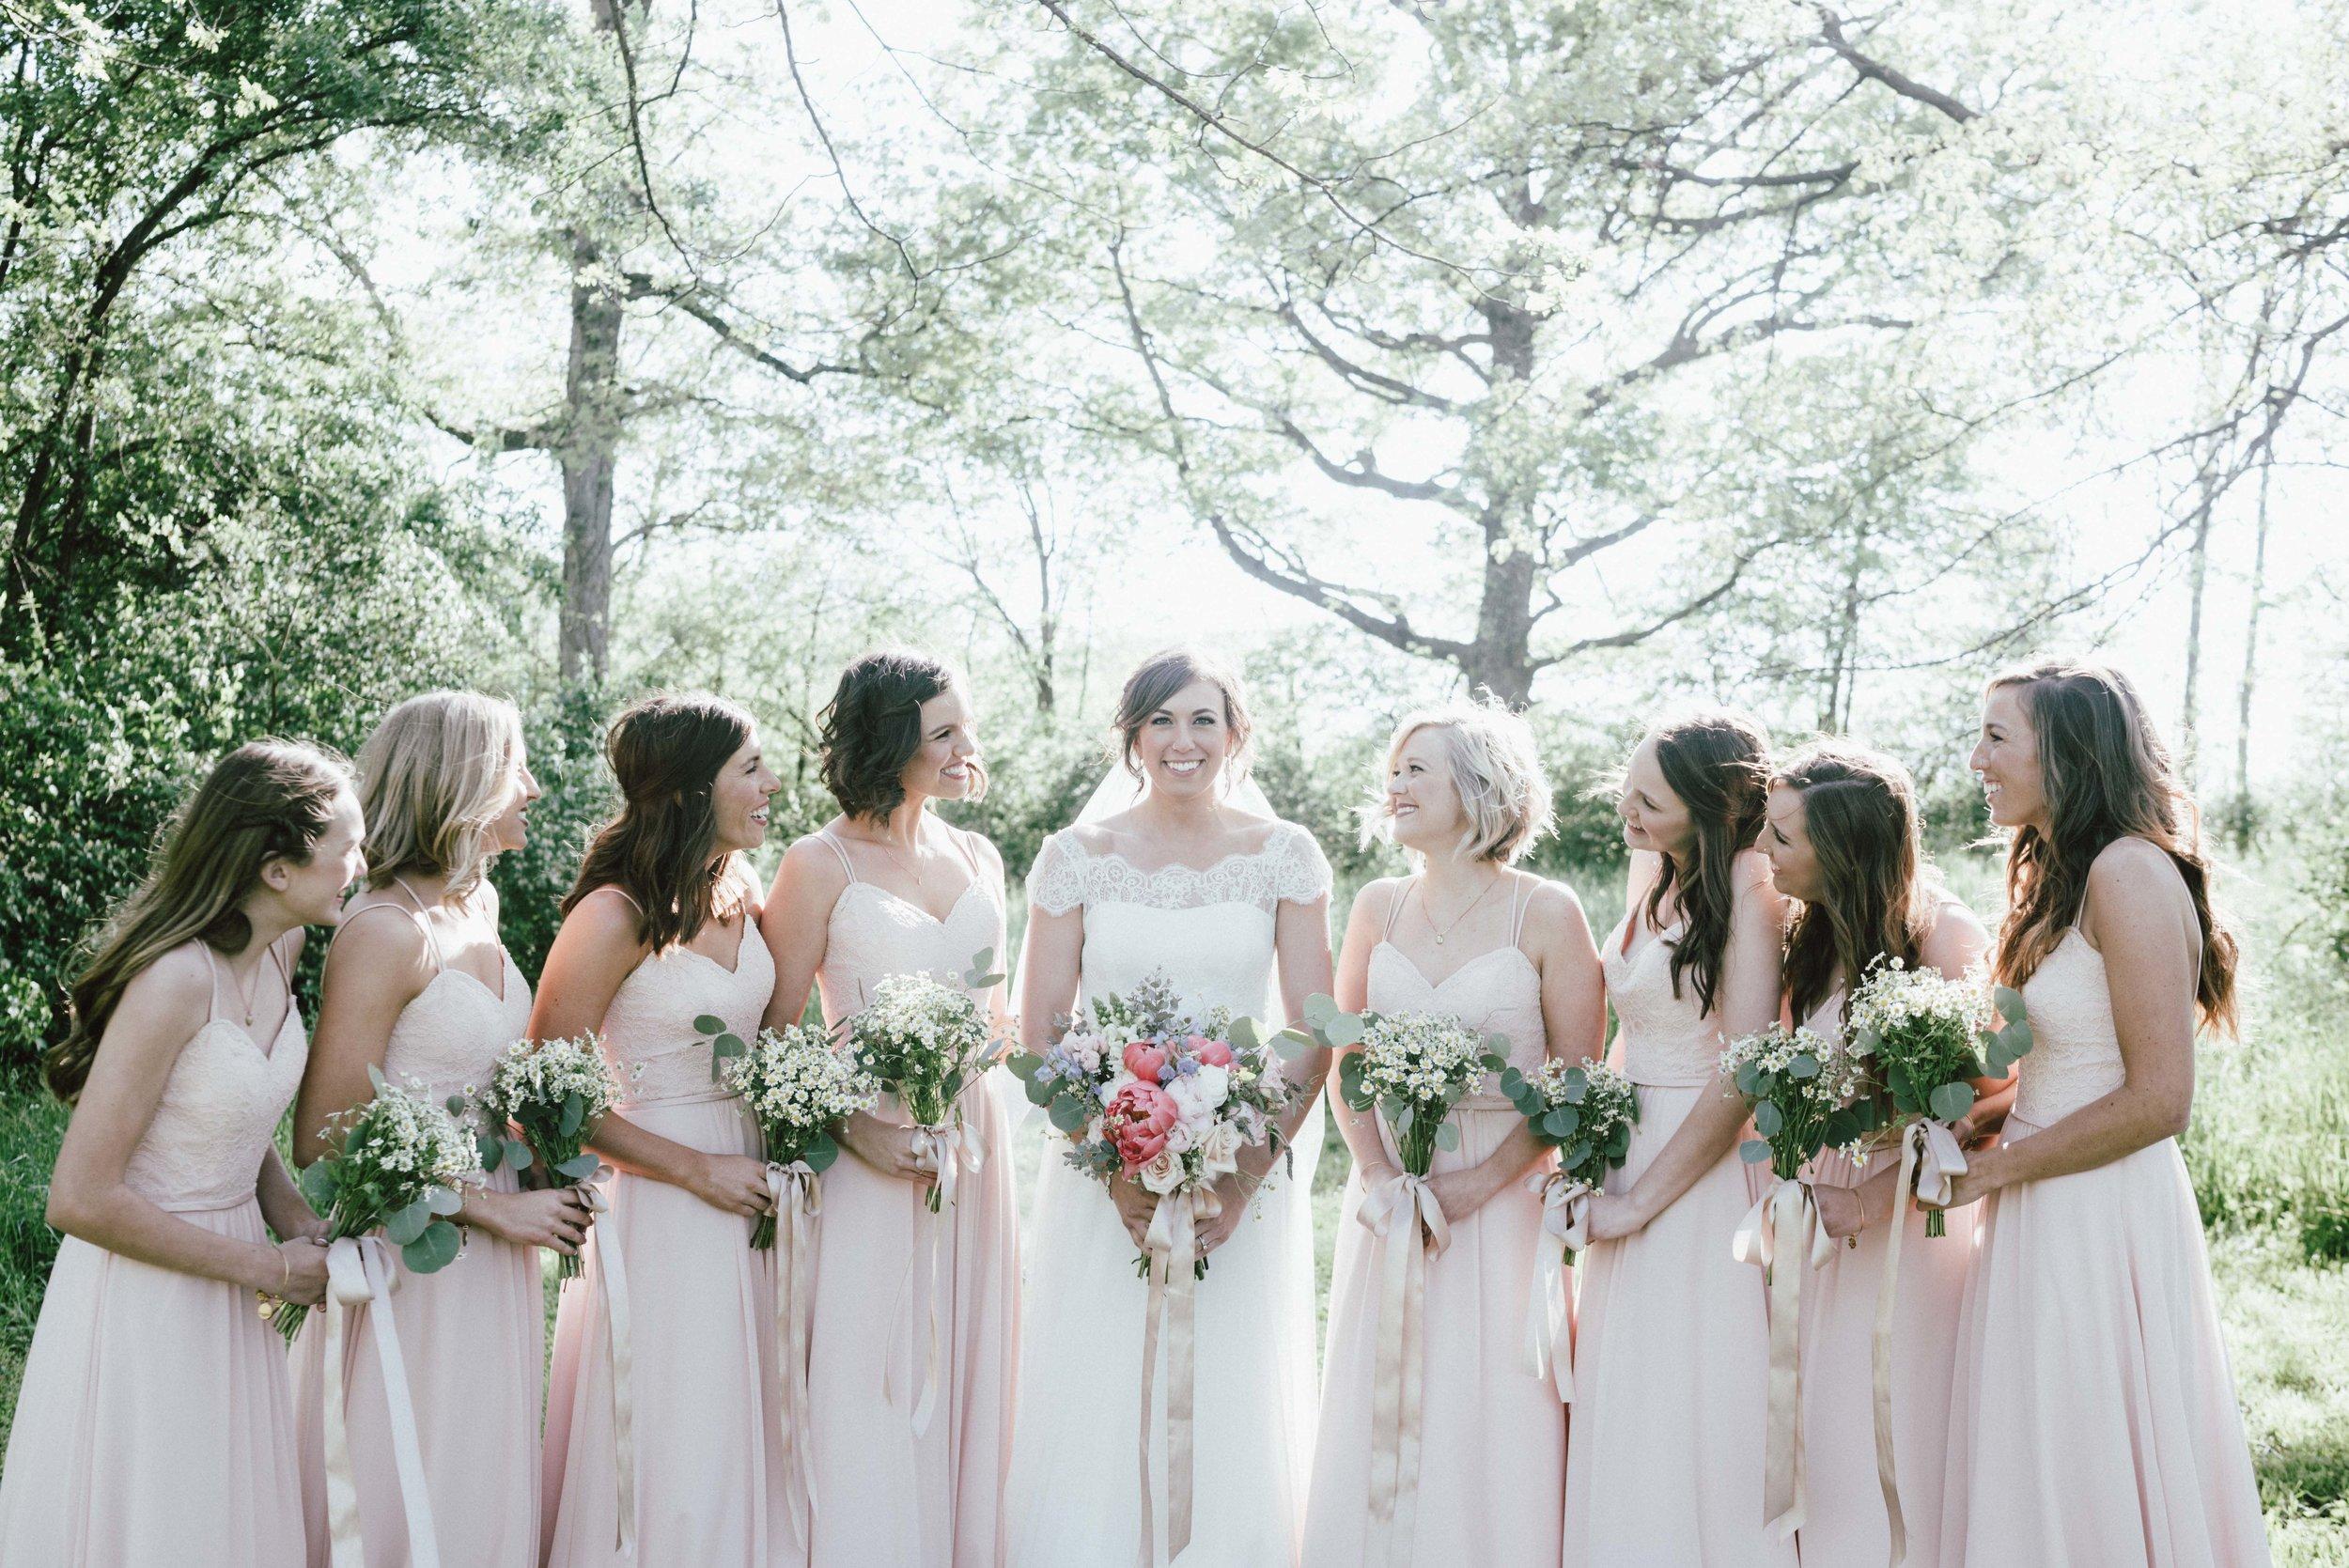 Steph-Ben-Blog-Indianapolis-Wedding-44.jpg